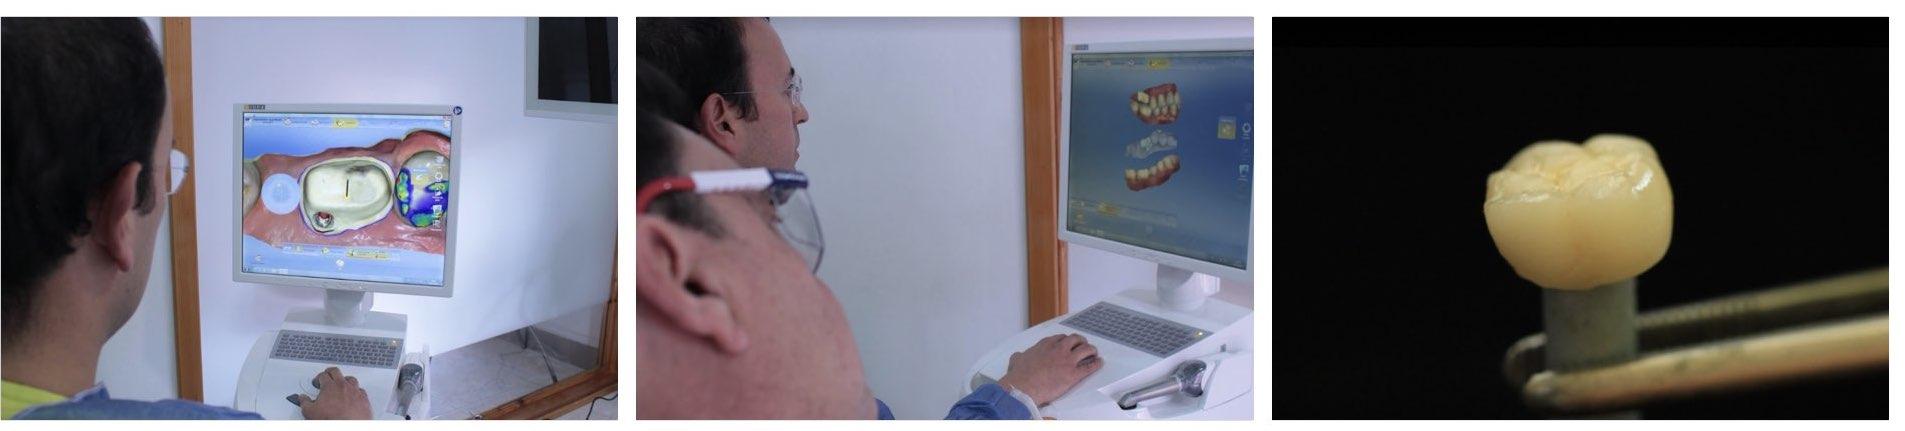 Dental Cadcam Proces Salud Oral Chiapas México